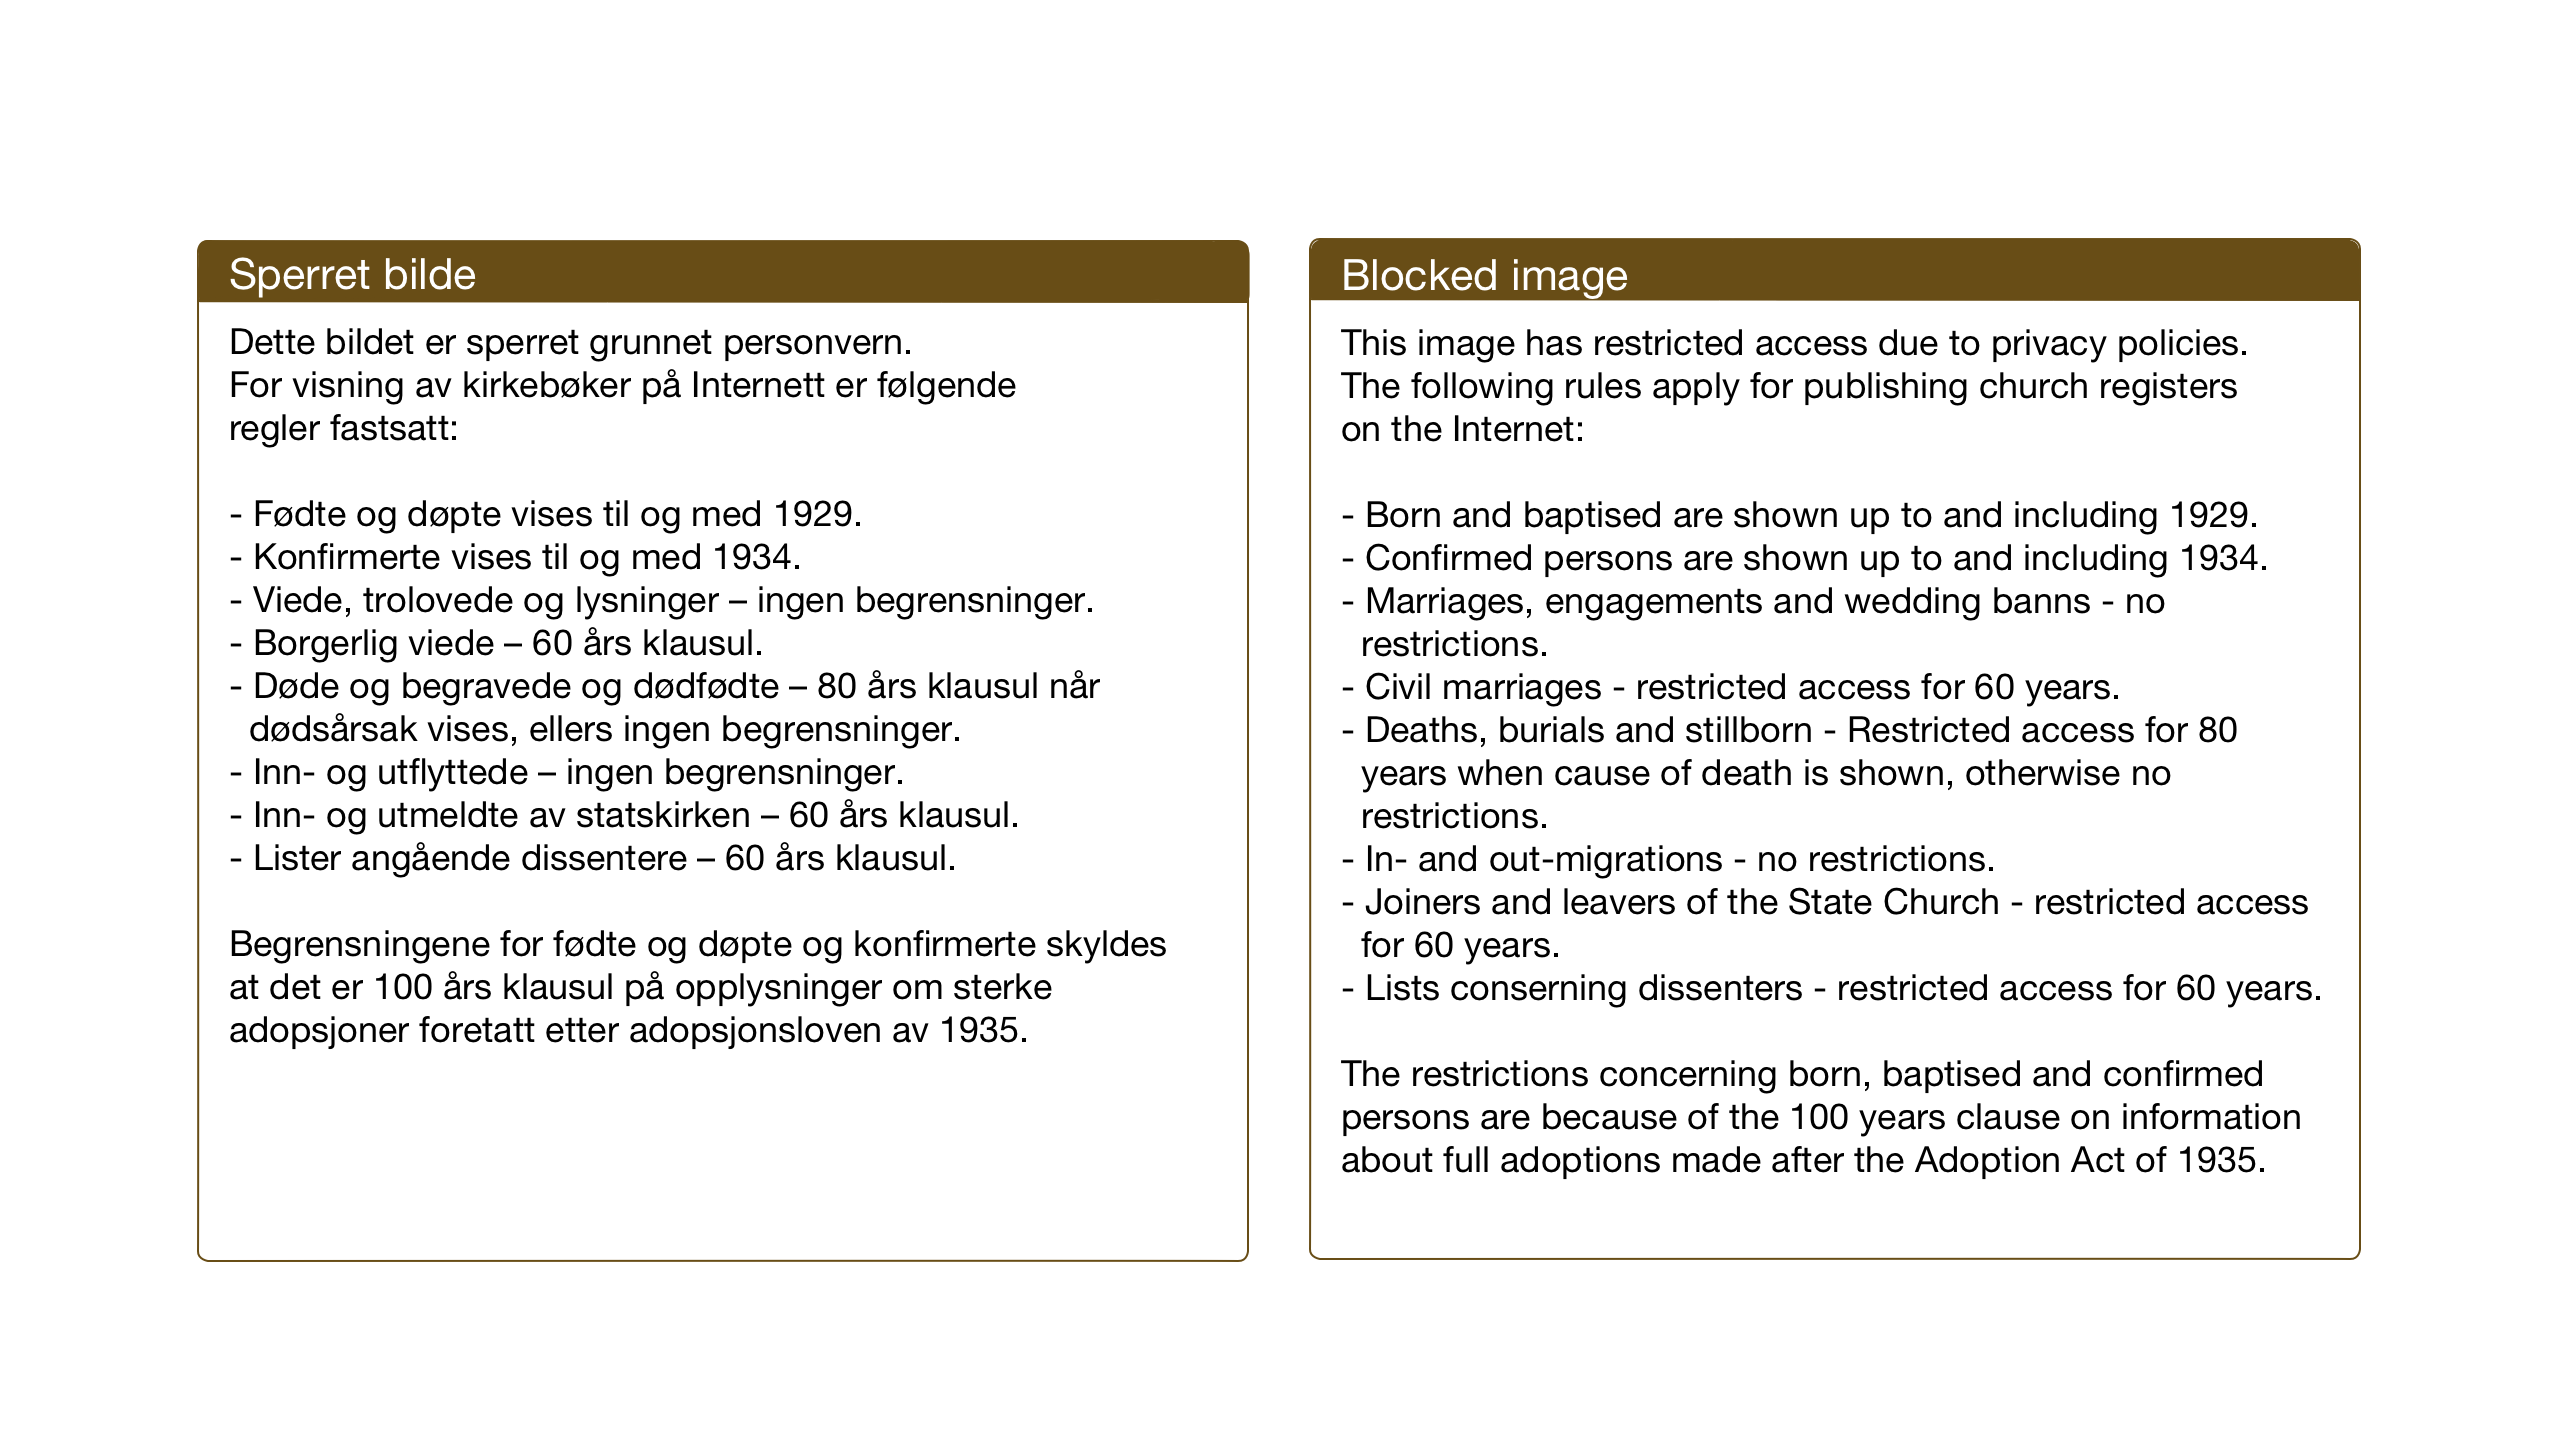 SAT, Ministerialprotokoller, klokkerbøker og fødselsregistre - Nordland, 846/L0650: Ministerialbok nr. 846A08, 1916-1935, s. 93